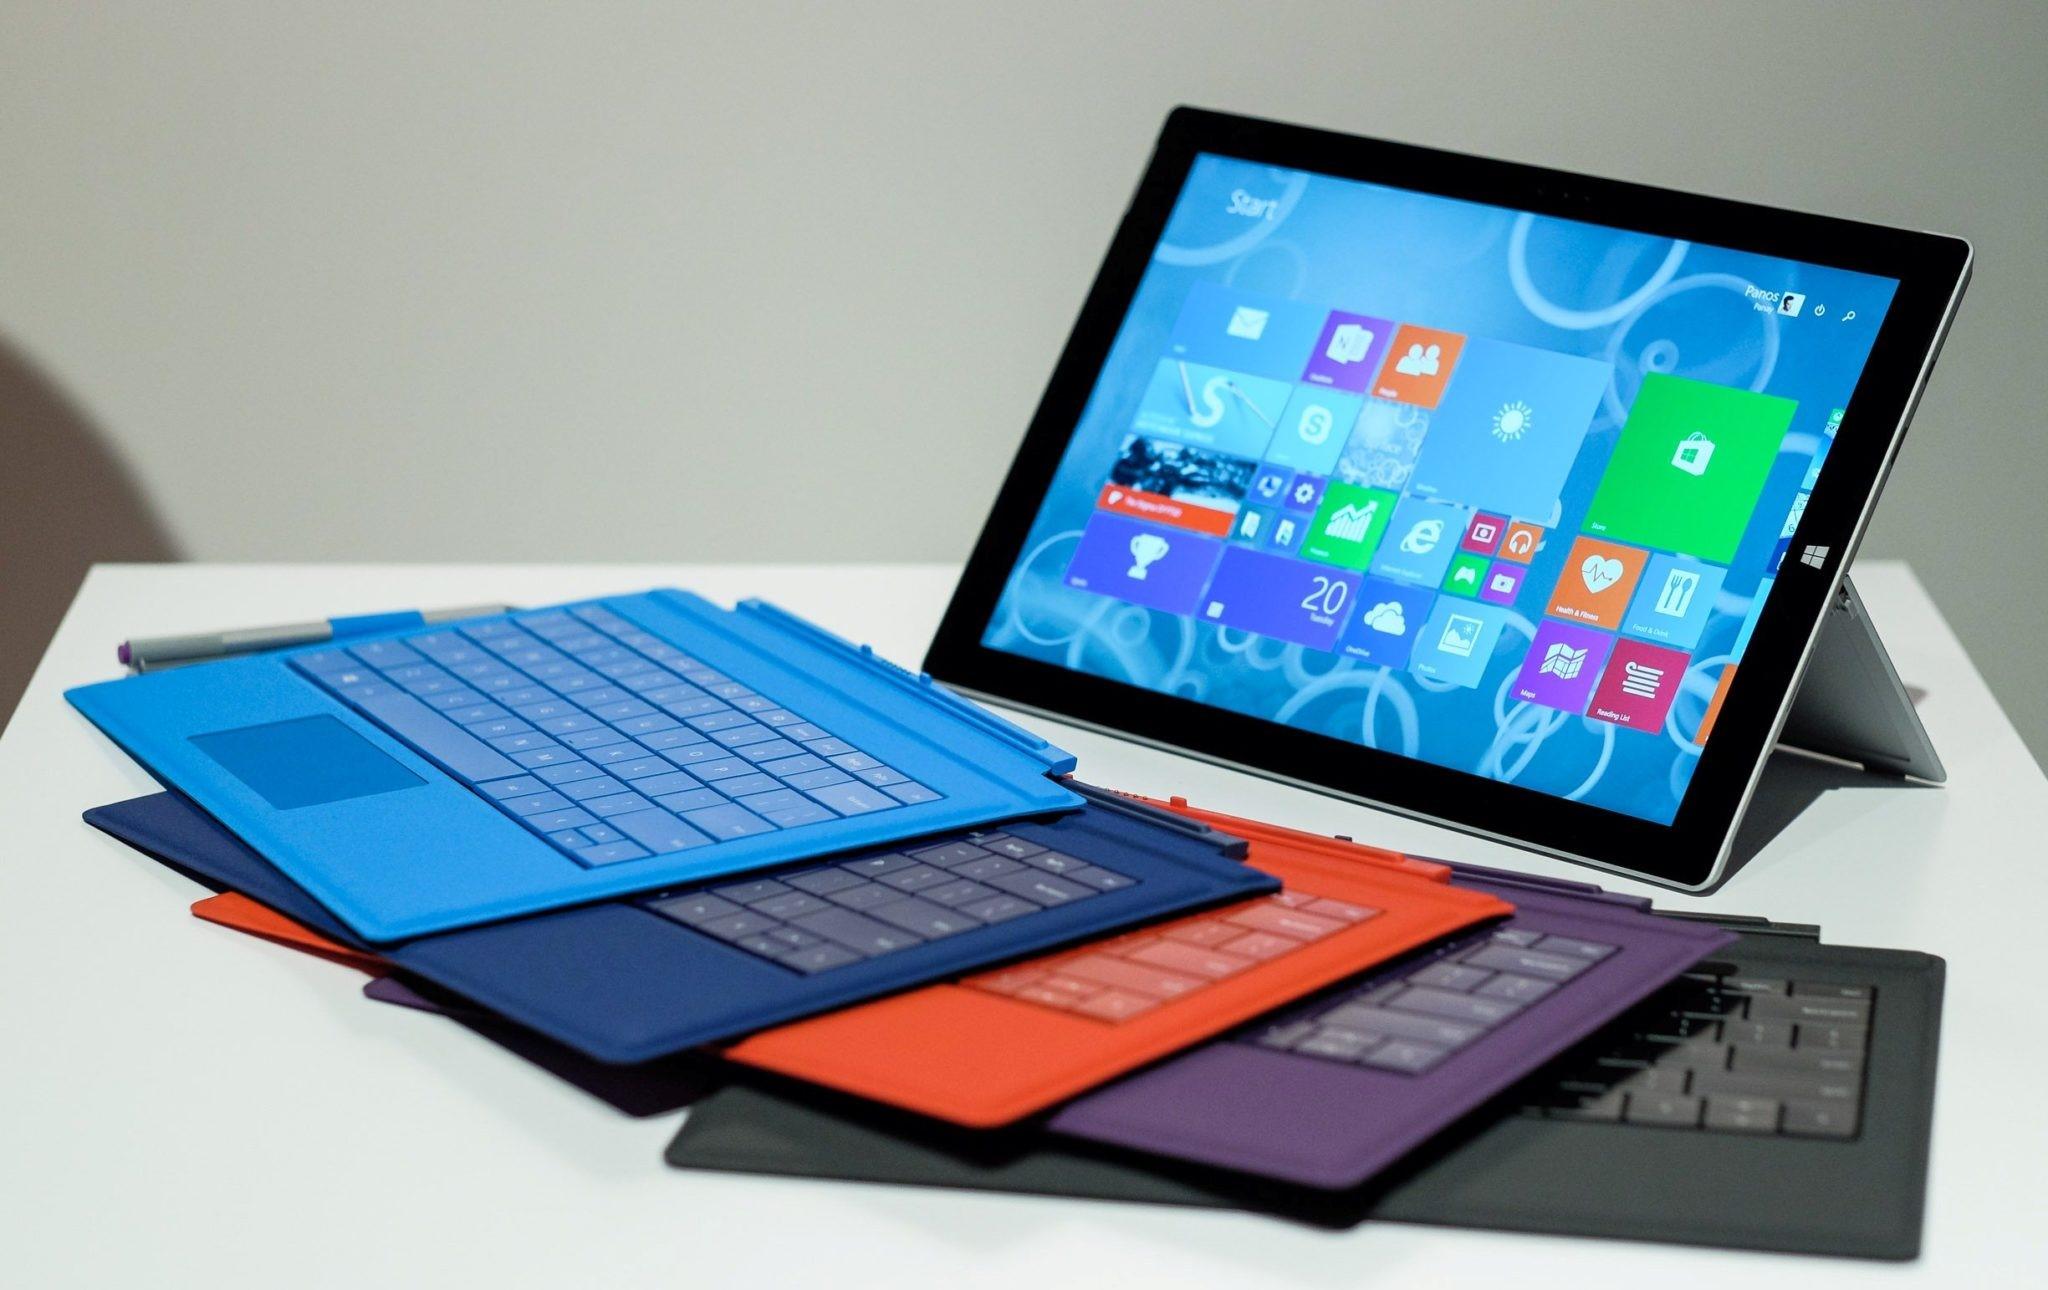 Рис. 1. Пятое поколение Surface Pro от Microsoft.